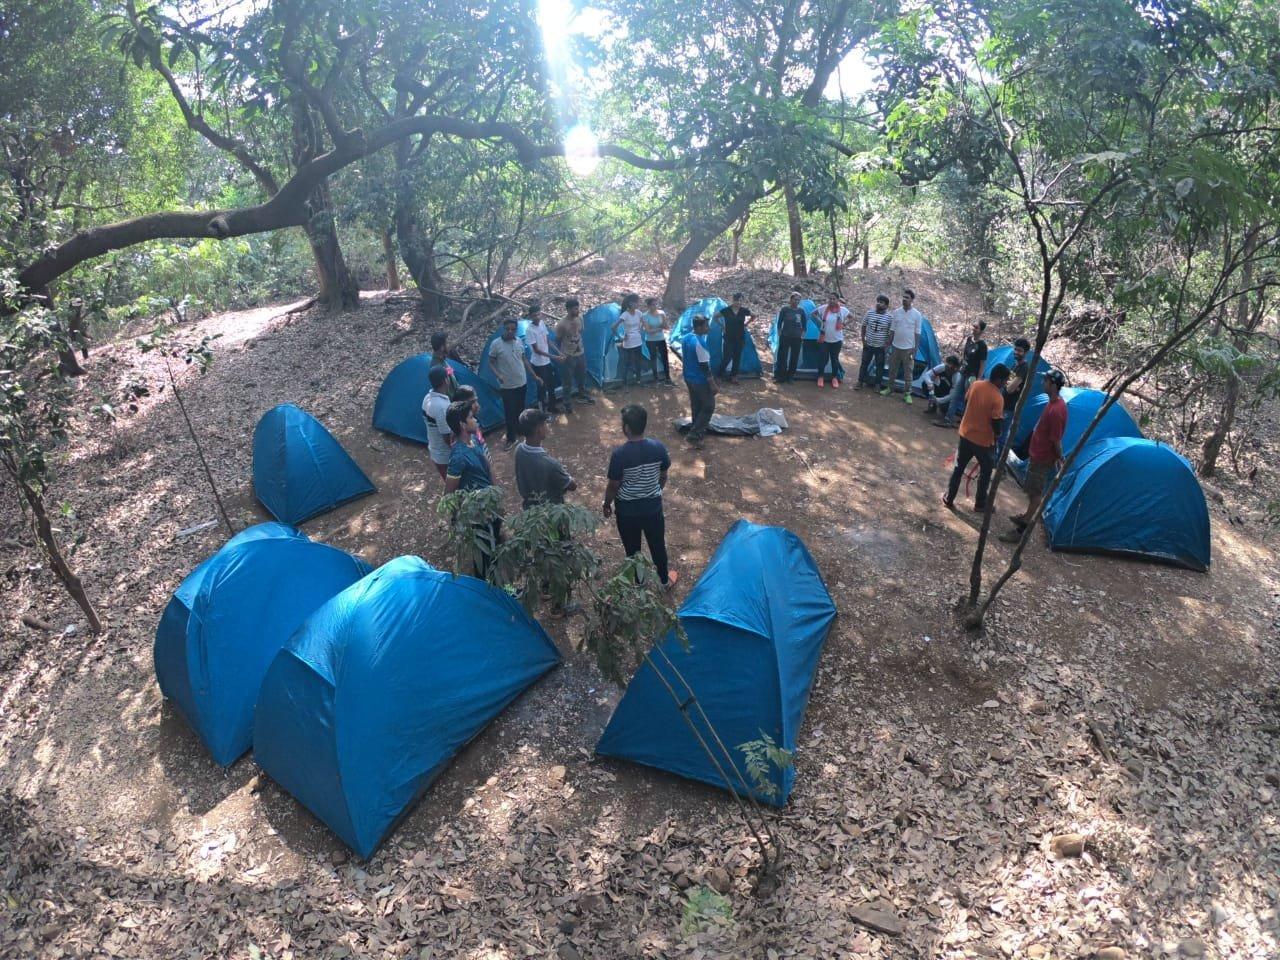 Rajmachi Fireflies Camping